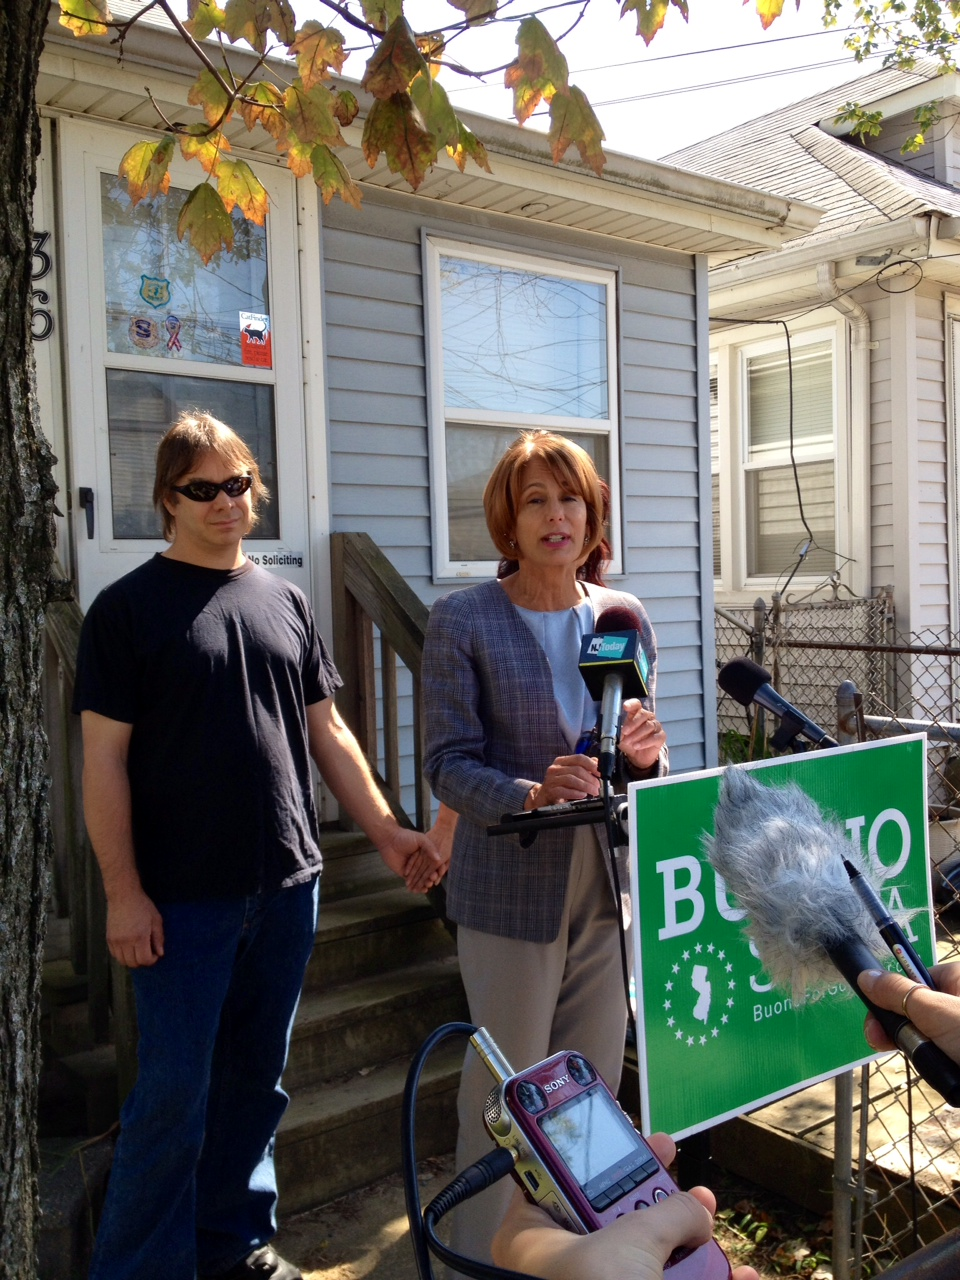 Buono highlights Sandy victims she says administration has left stranded